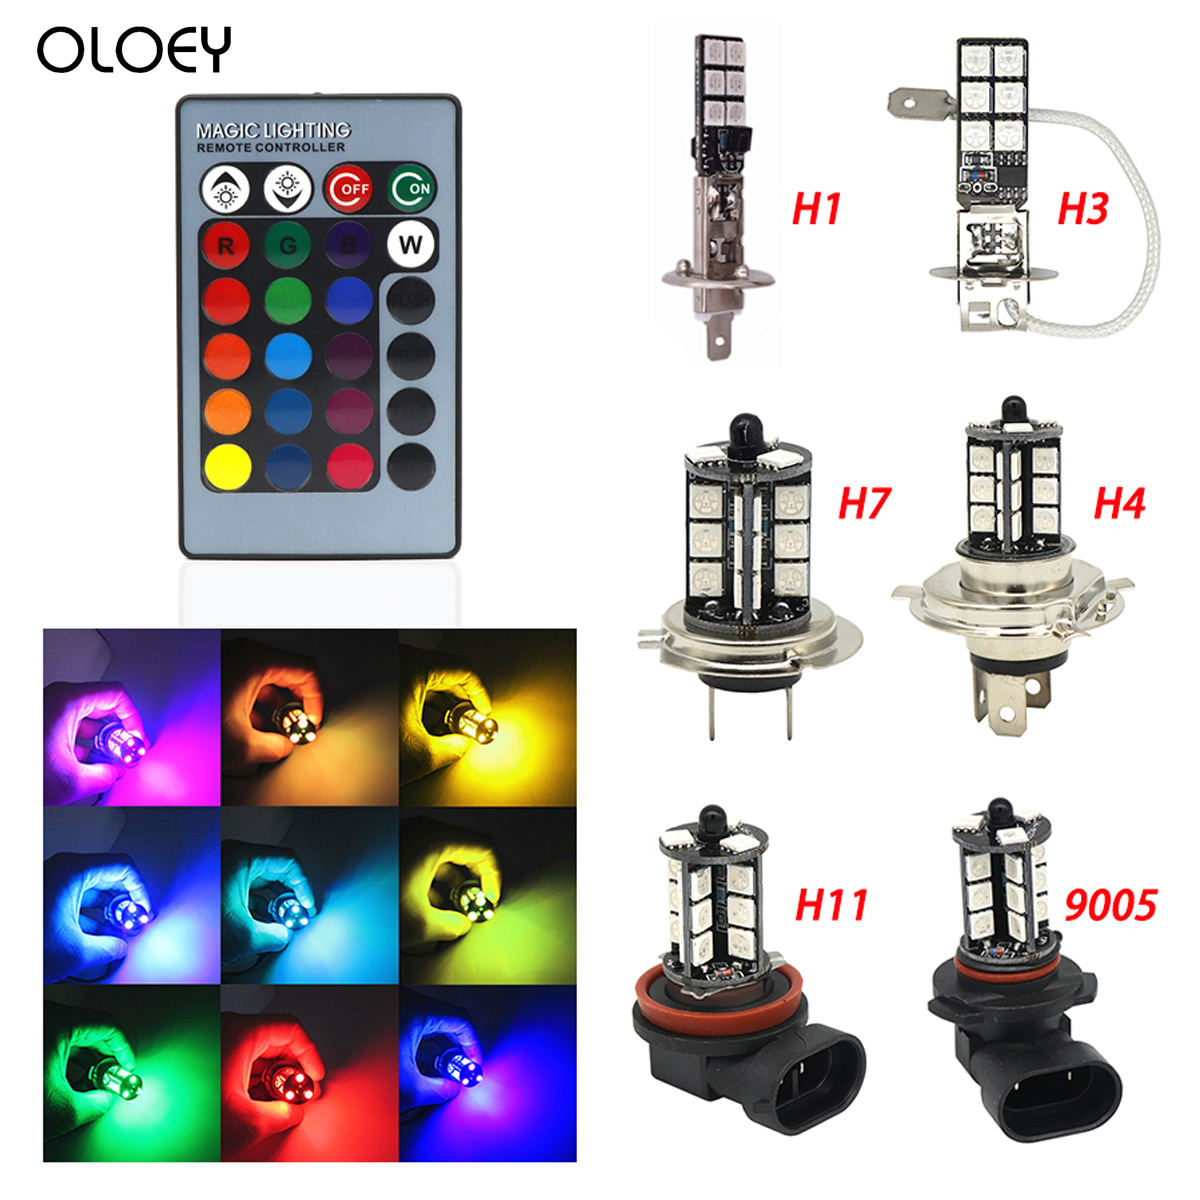 2x H11 H9 H8 5050 LED 27SMD RGB Car Headlight Fog Light Lamp Bulb Remote Control